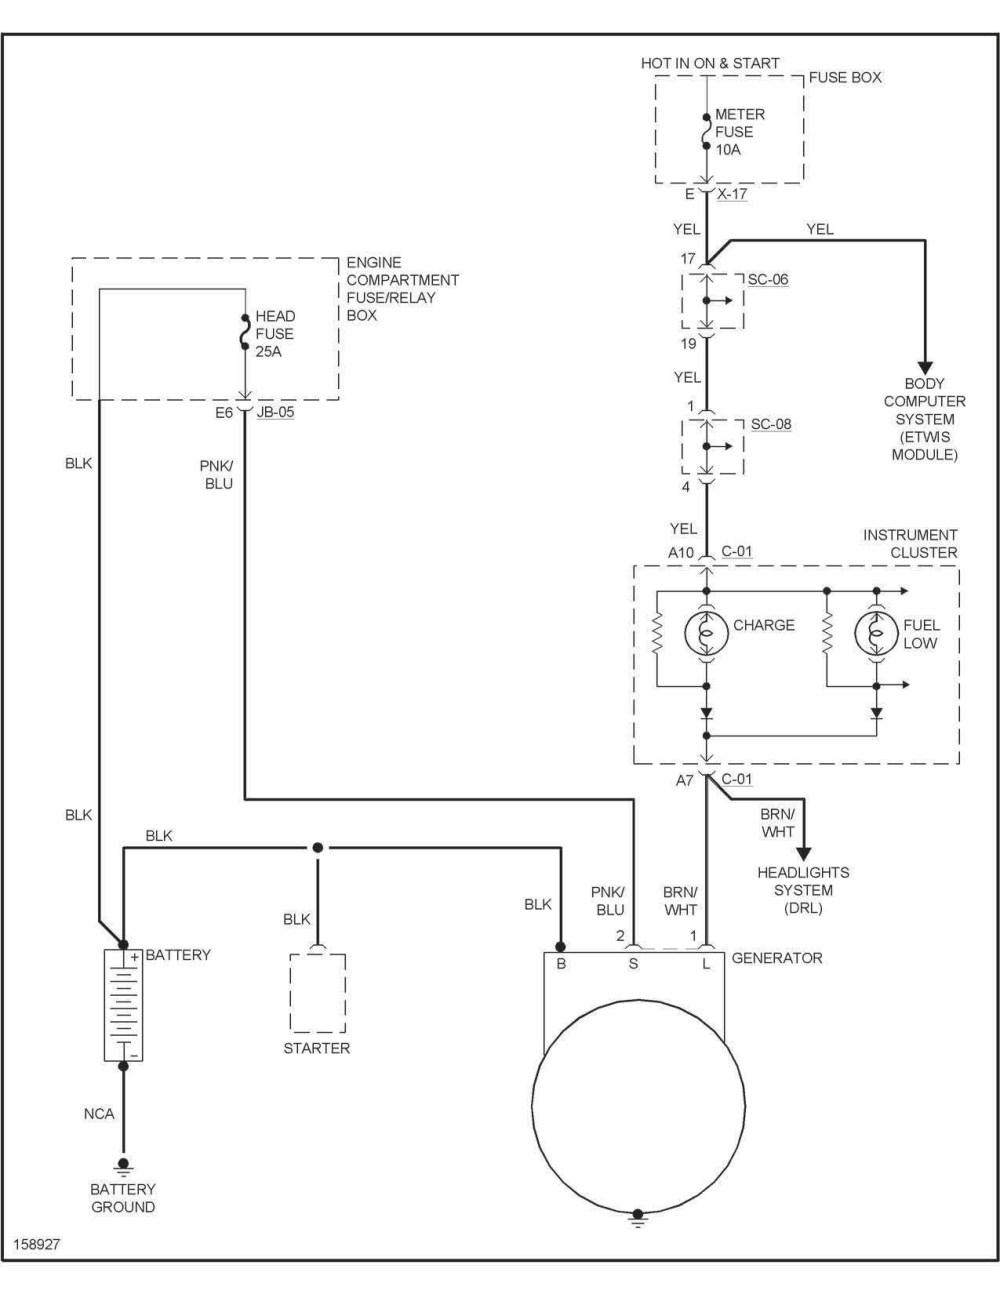 medium resolution of kia alternator wiring diagram wiring diagram datakia sedona alternator wiring diagram besides 2005 kia sedona wiring